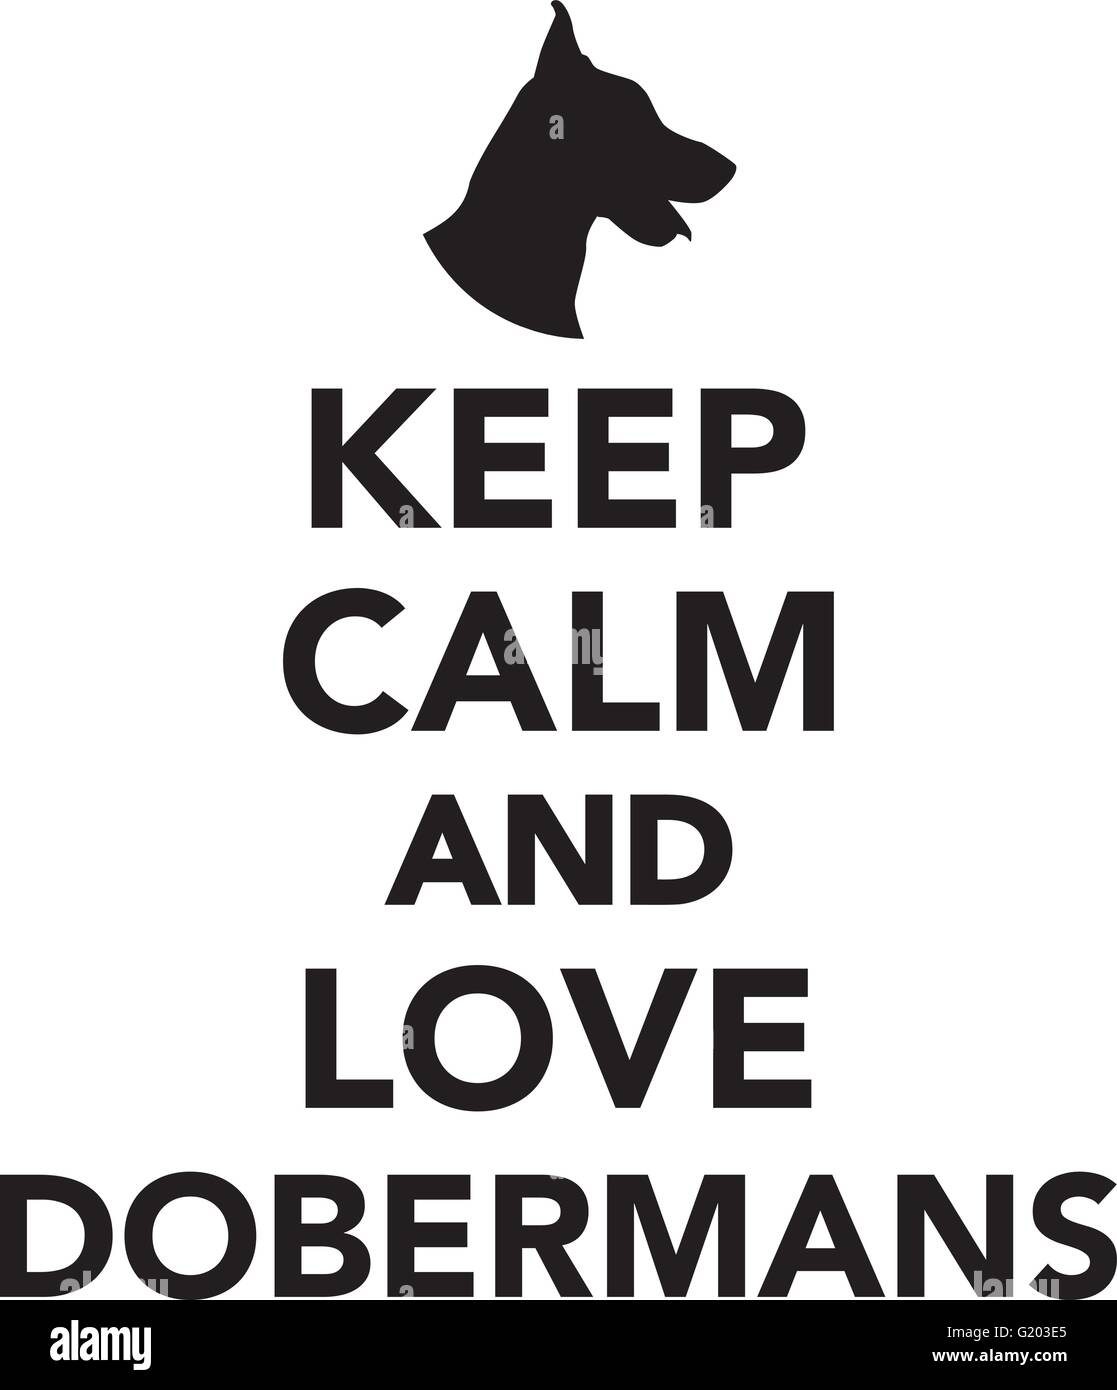 Keep calm and love Dobermans - Stock Vector